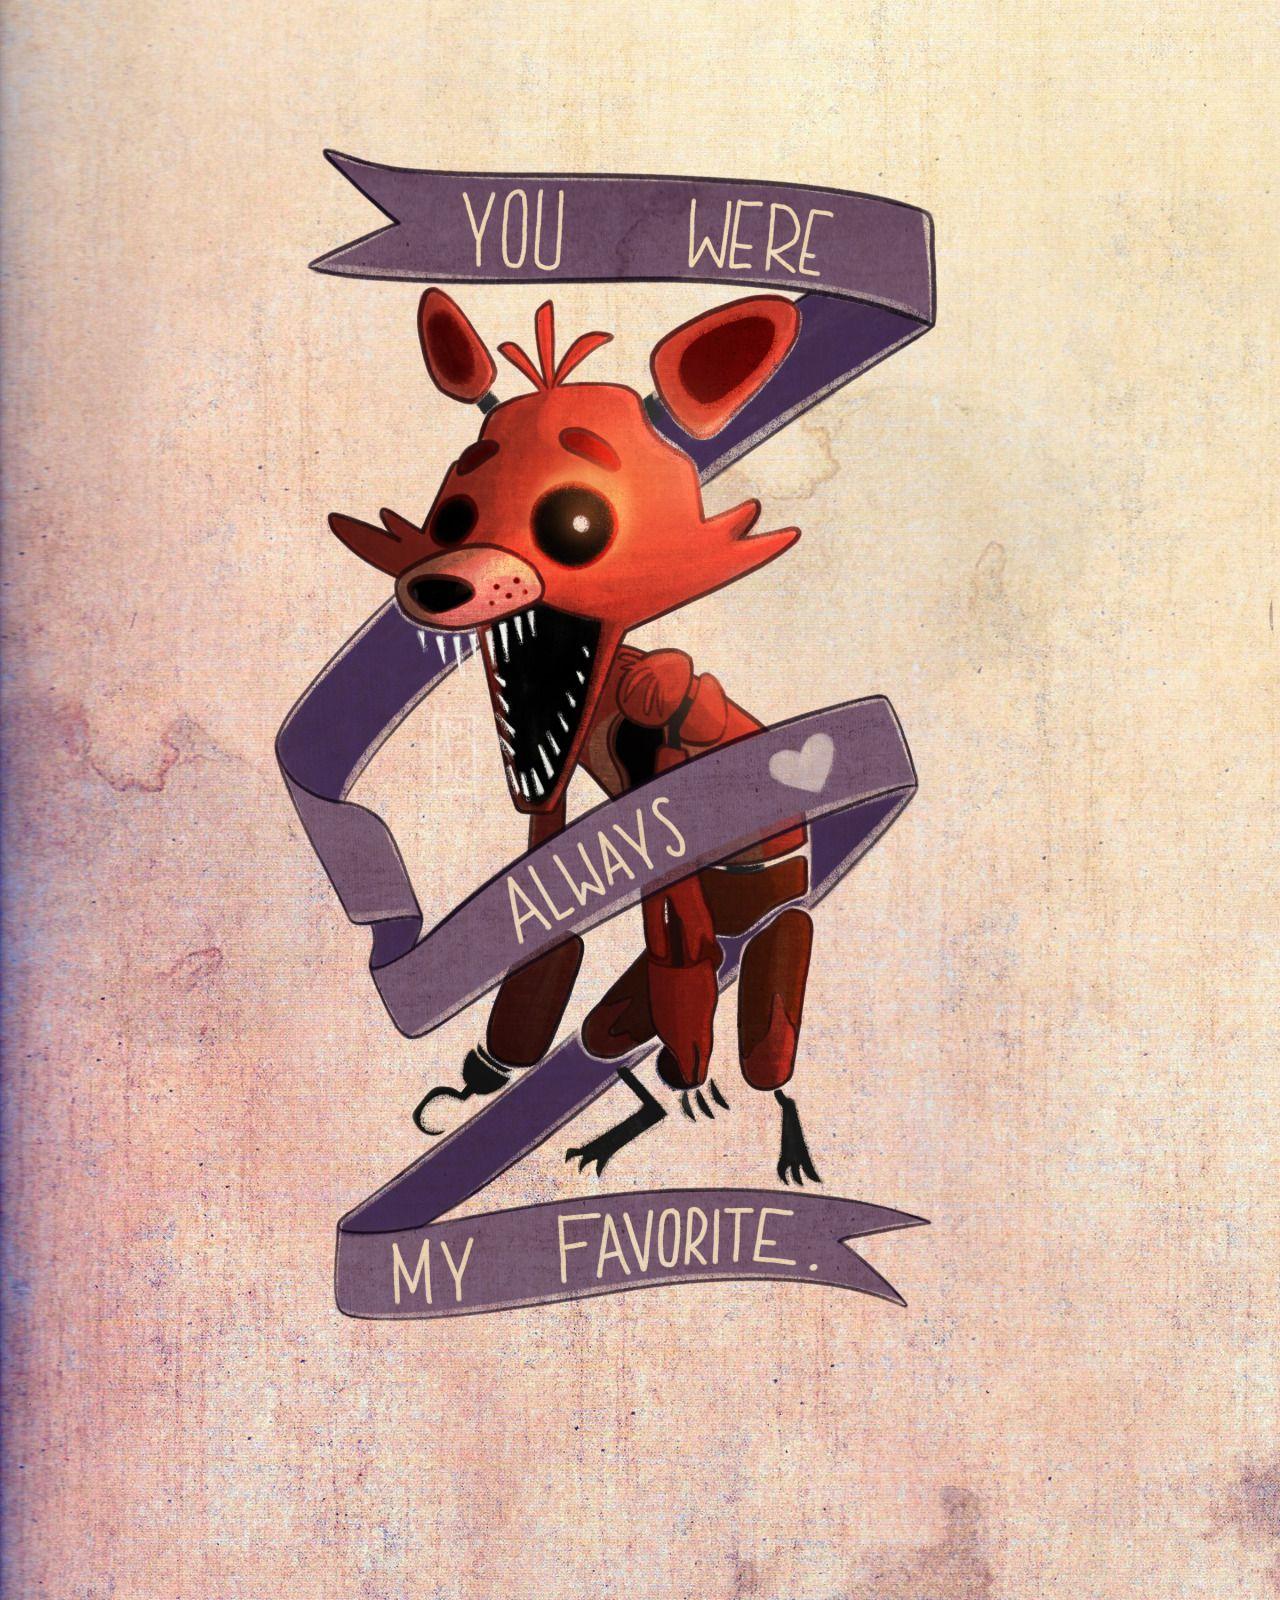 my favorite friend 4 ever ♥ Foxy the Pirate ♥